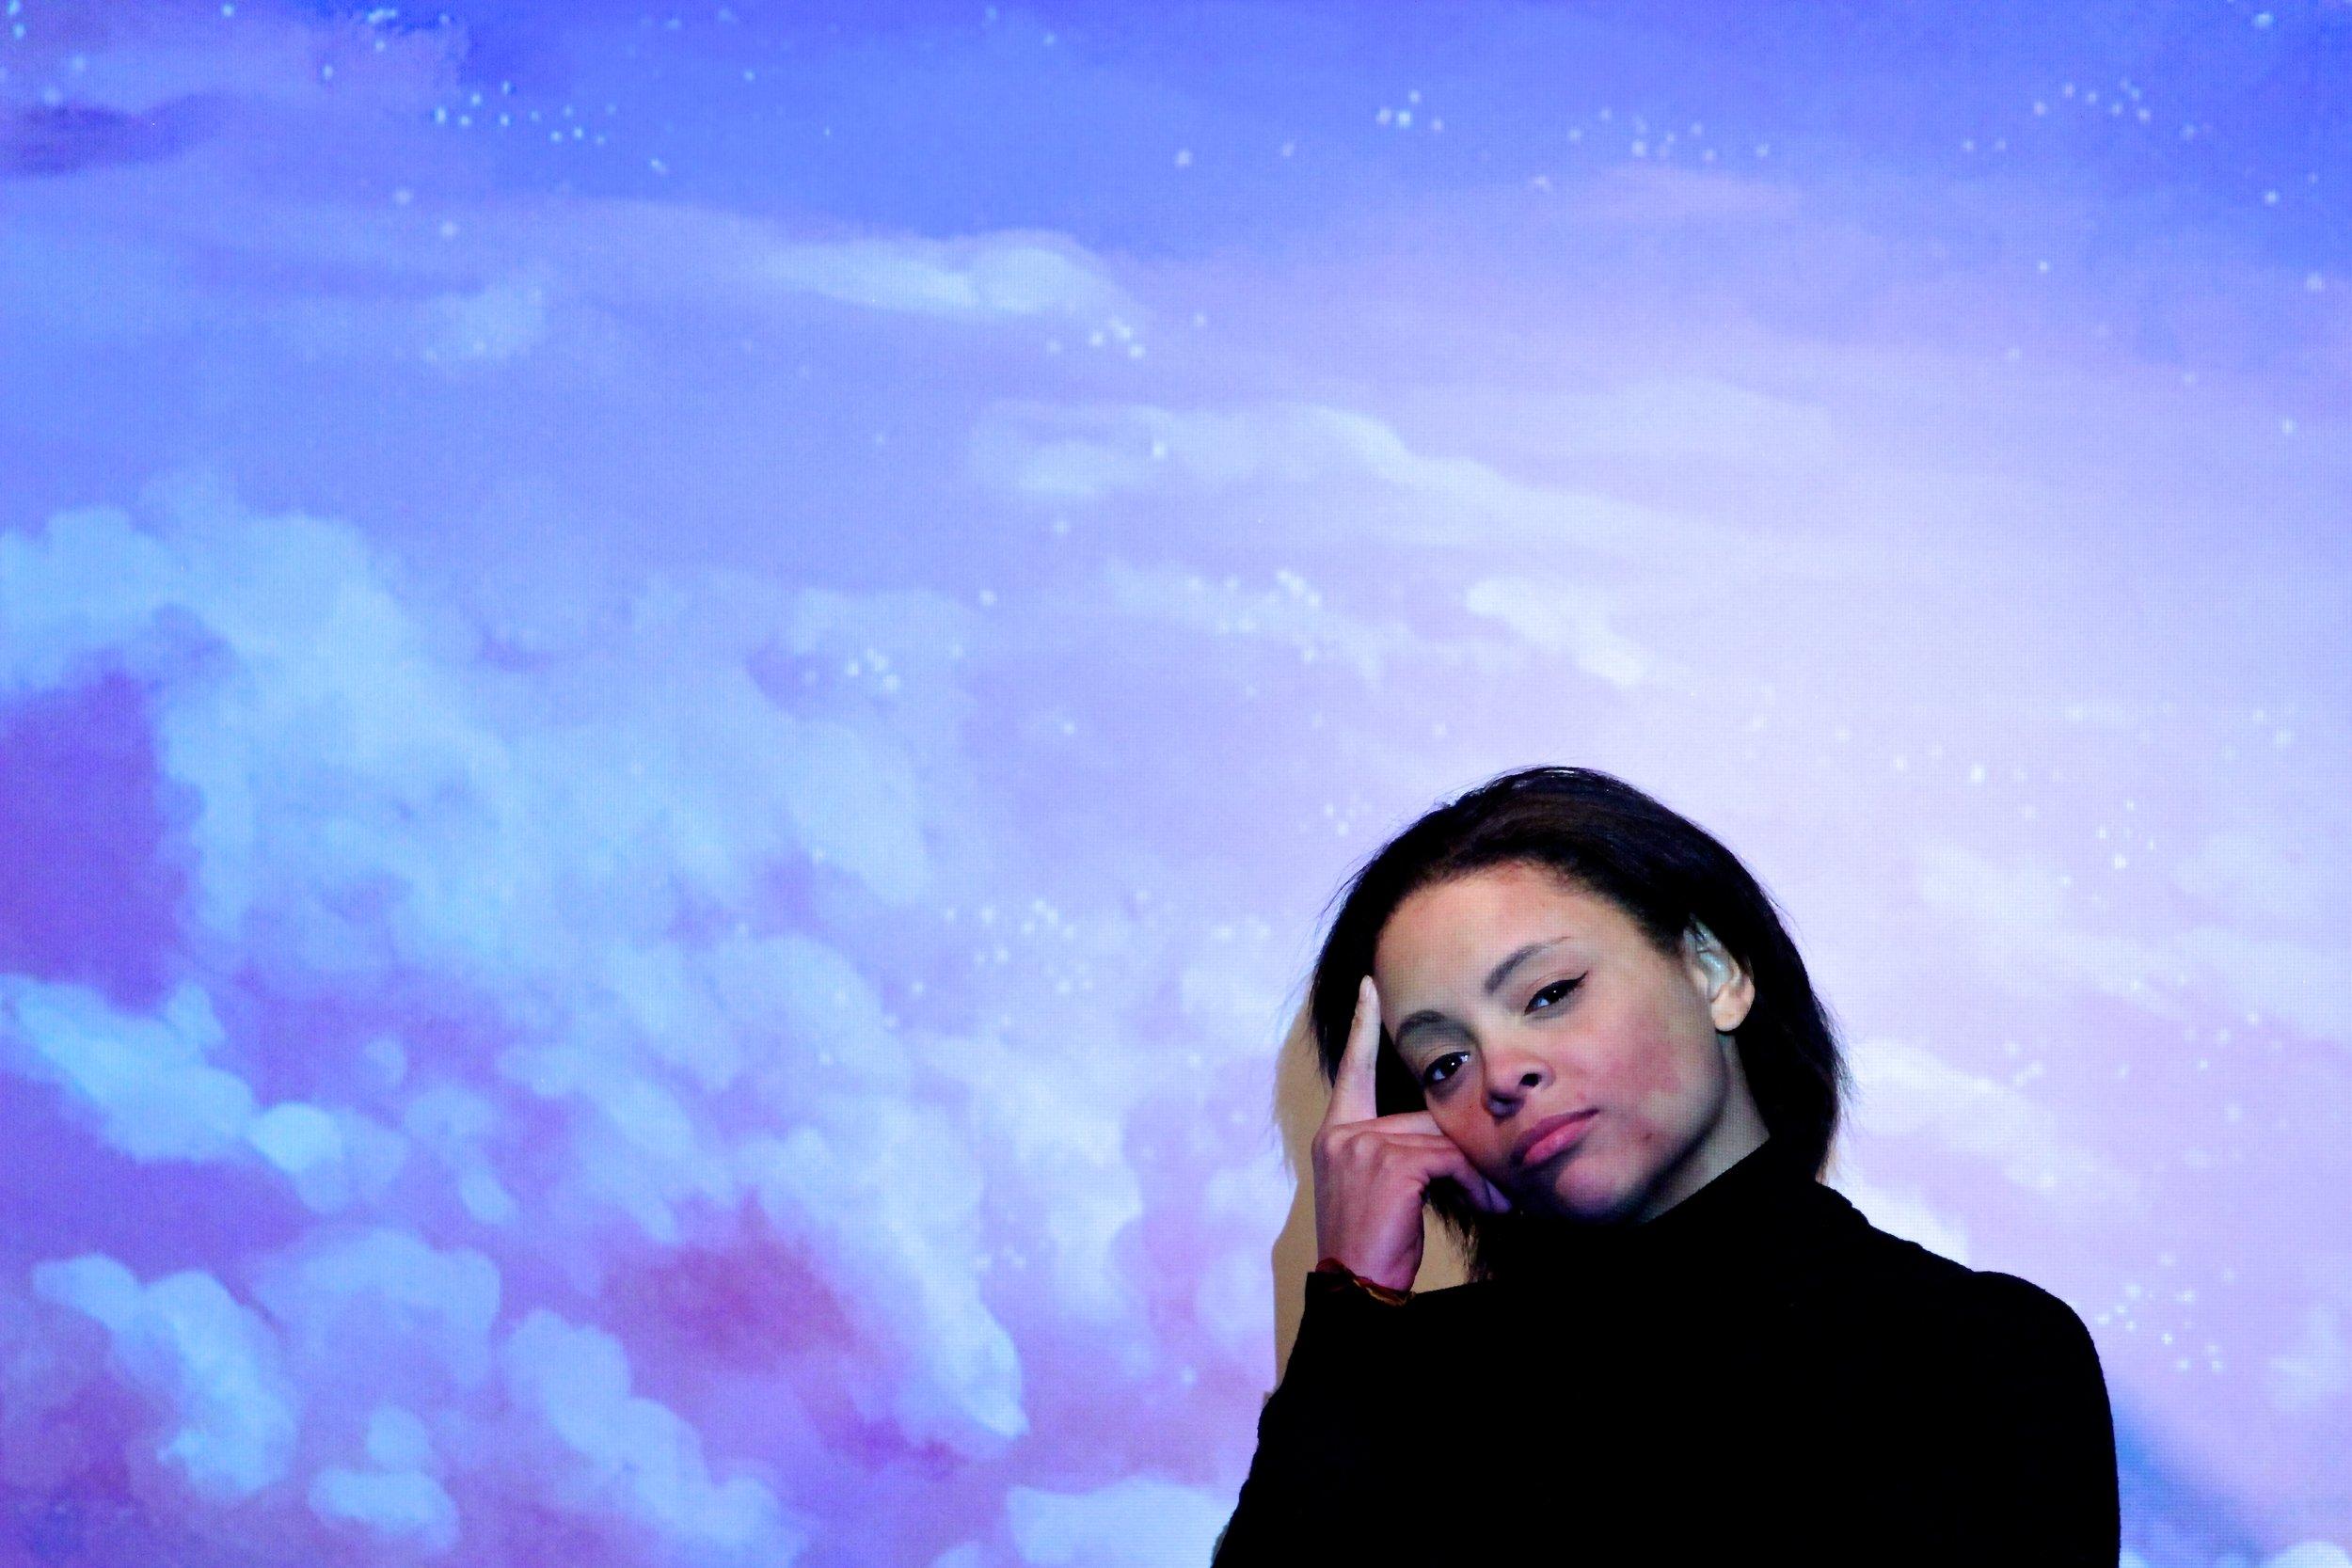 Model: Angela Ramos